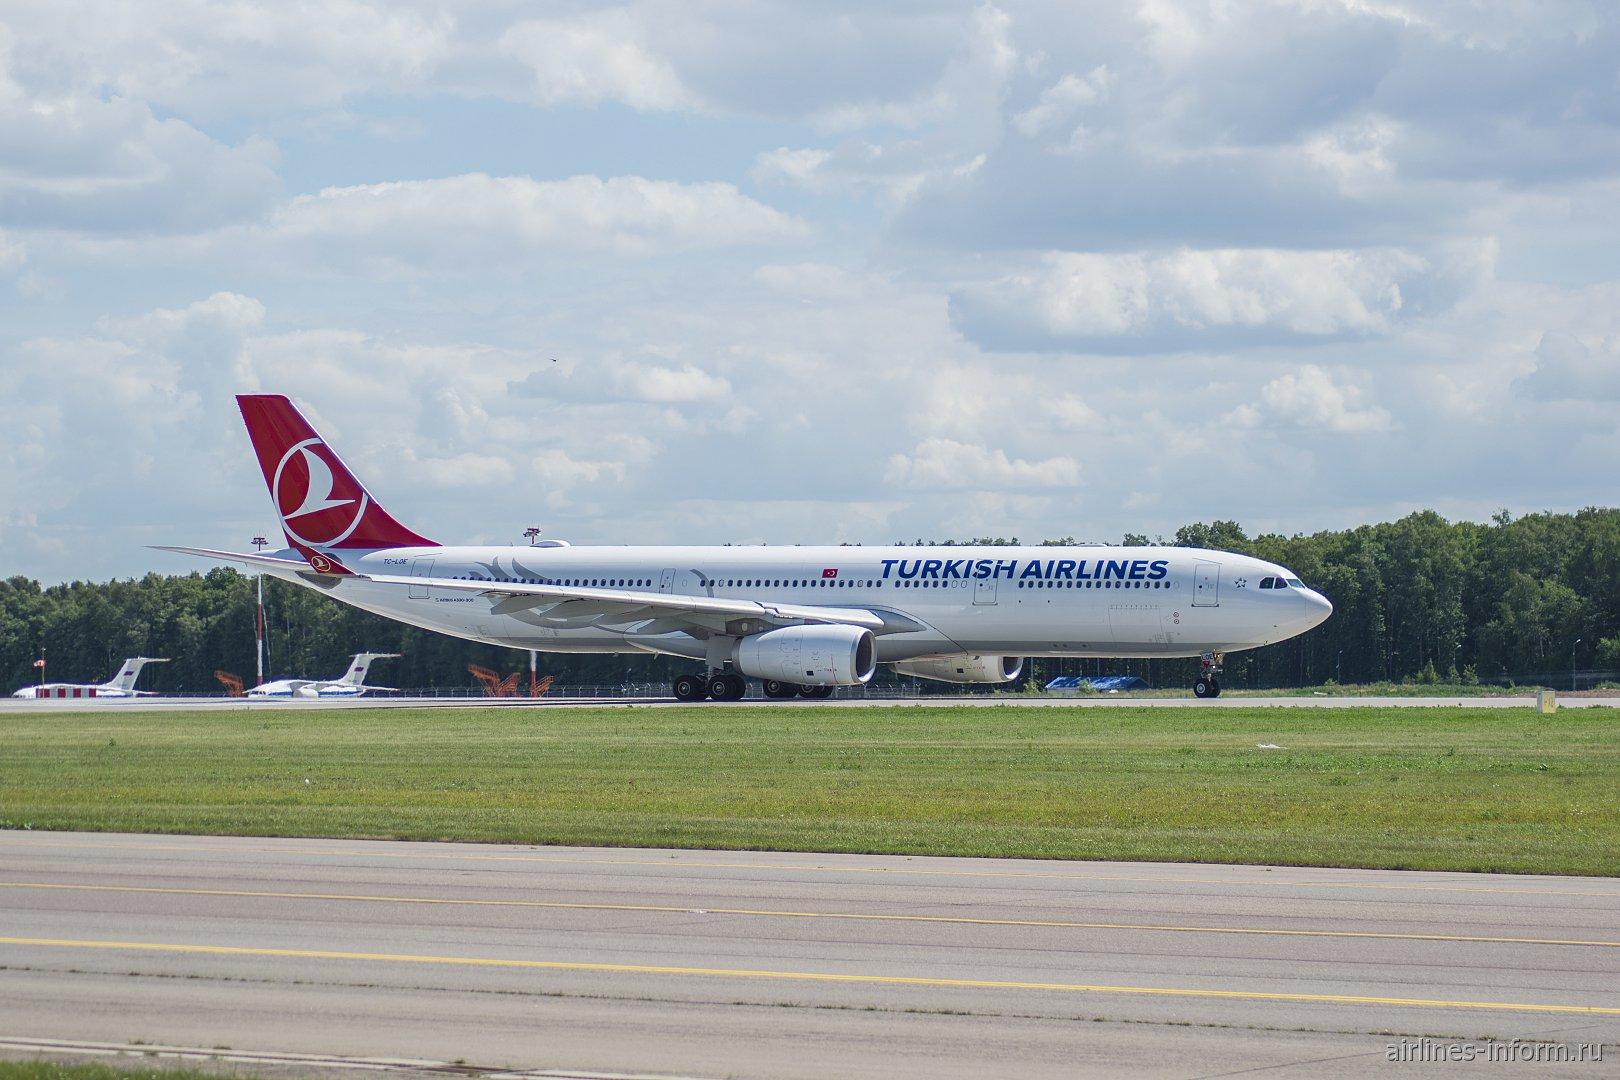 Airbus A330-300 Турецких авиалиний на рулежной дорожке в аэропорту Внуково